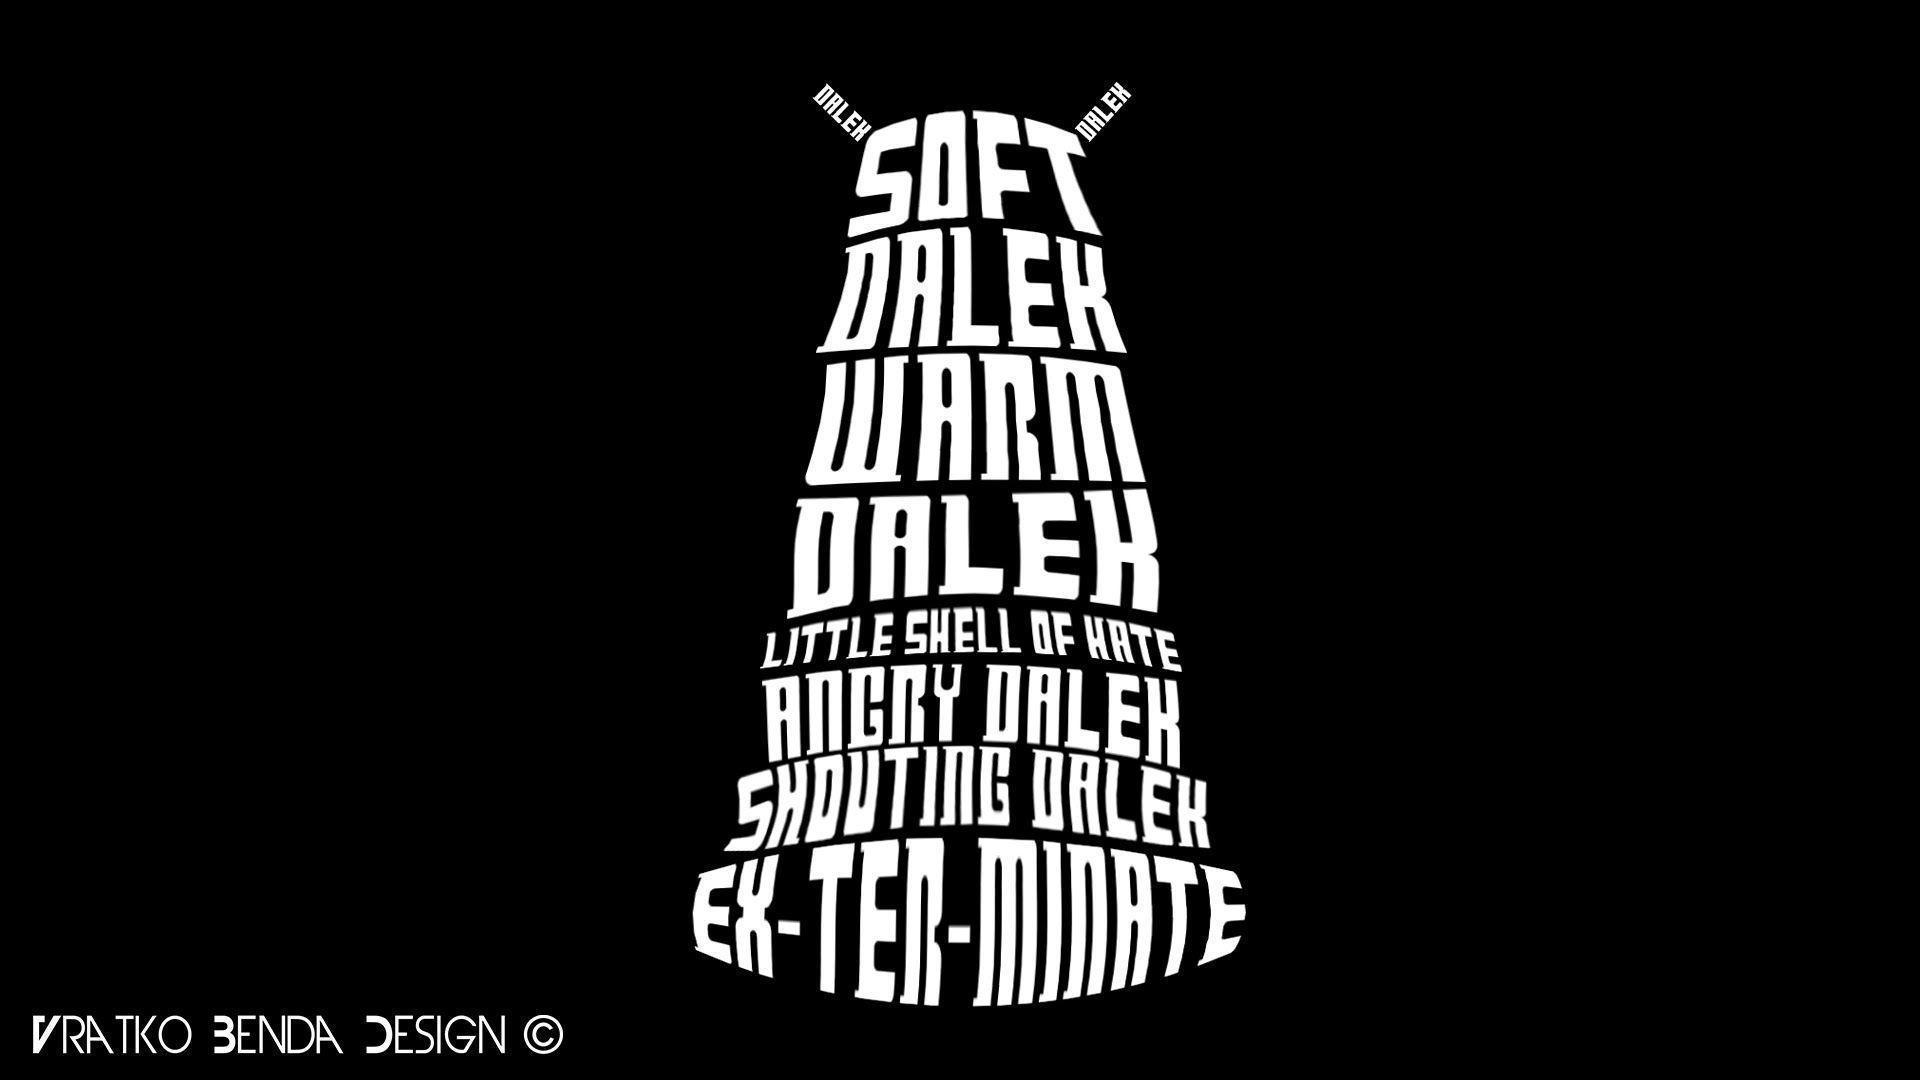 Snorlax Wallpaper Iphone Hd Dalek Wallpapers Wallpaper Cave